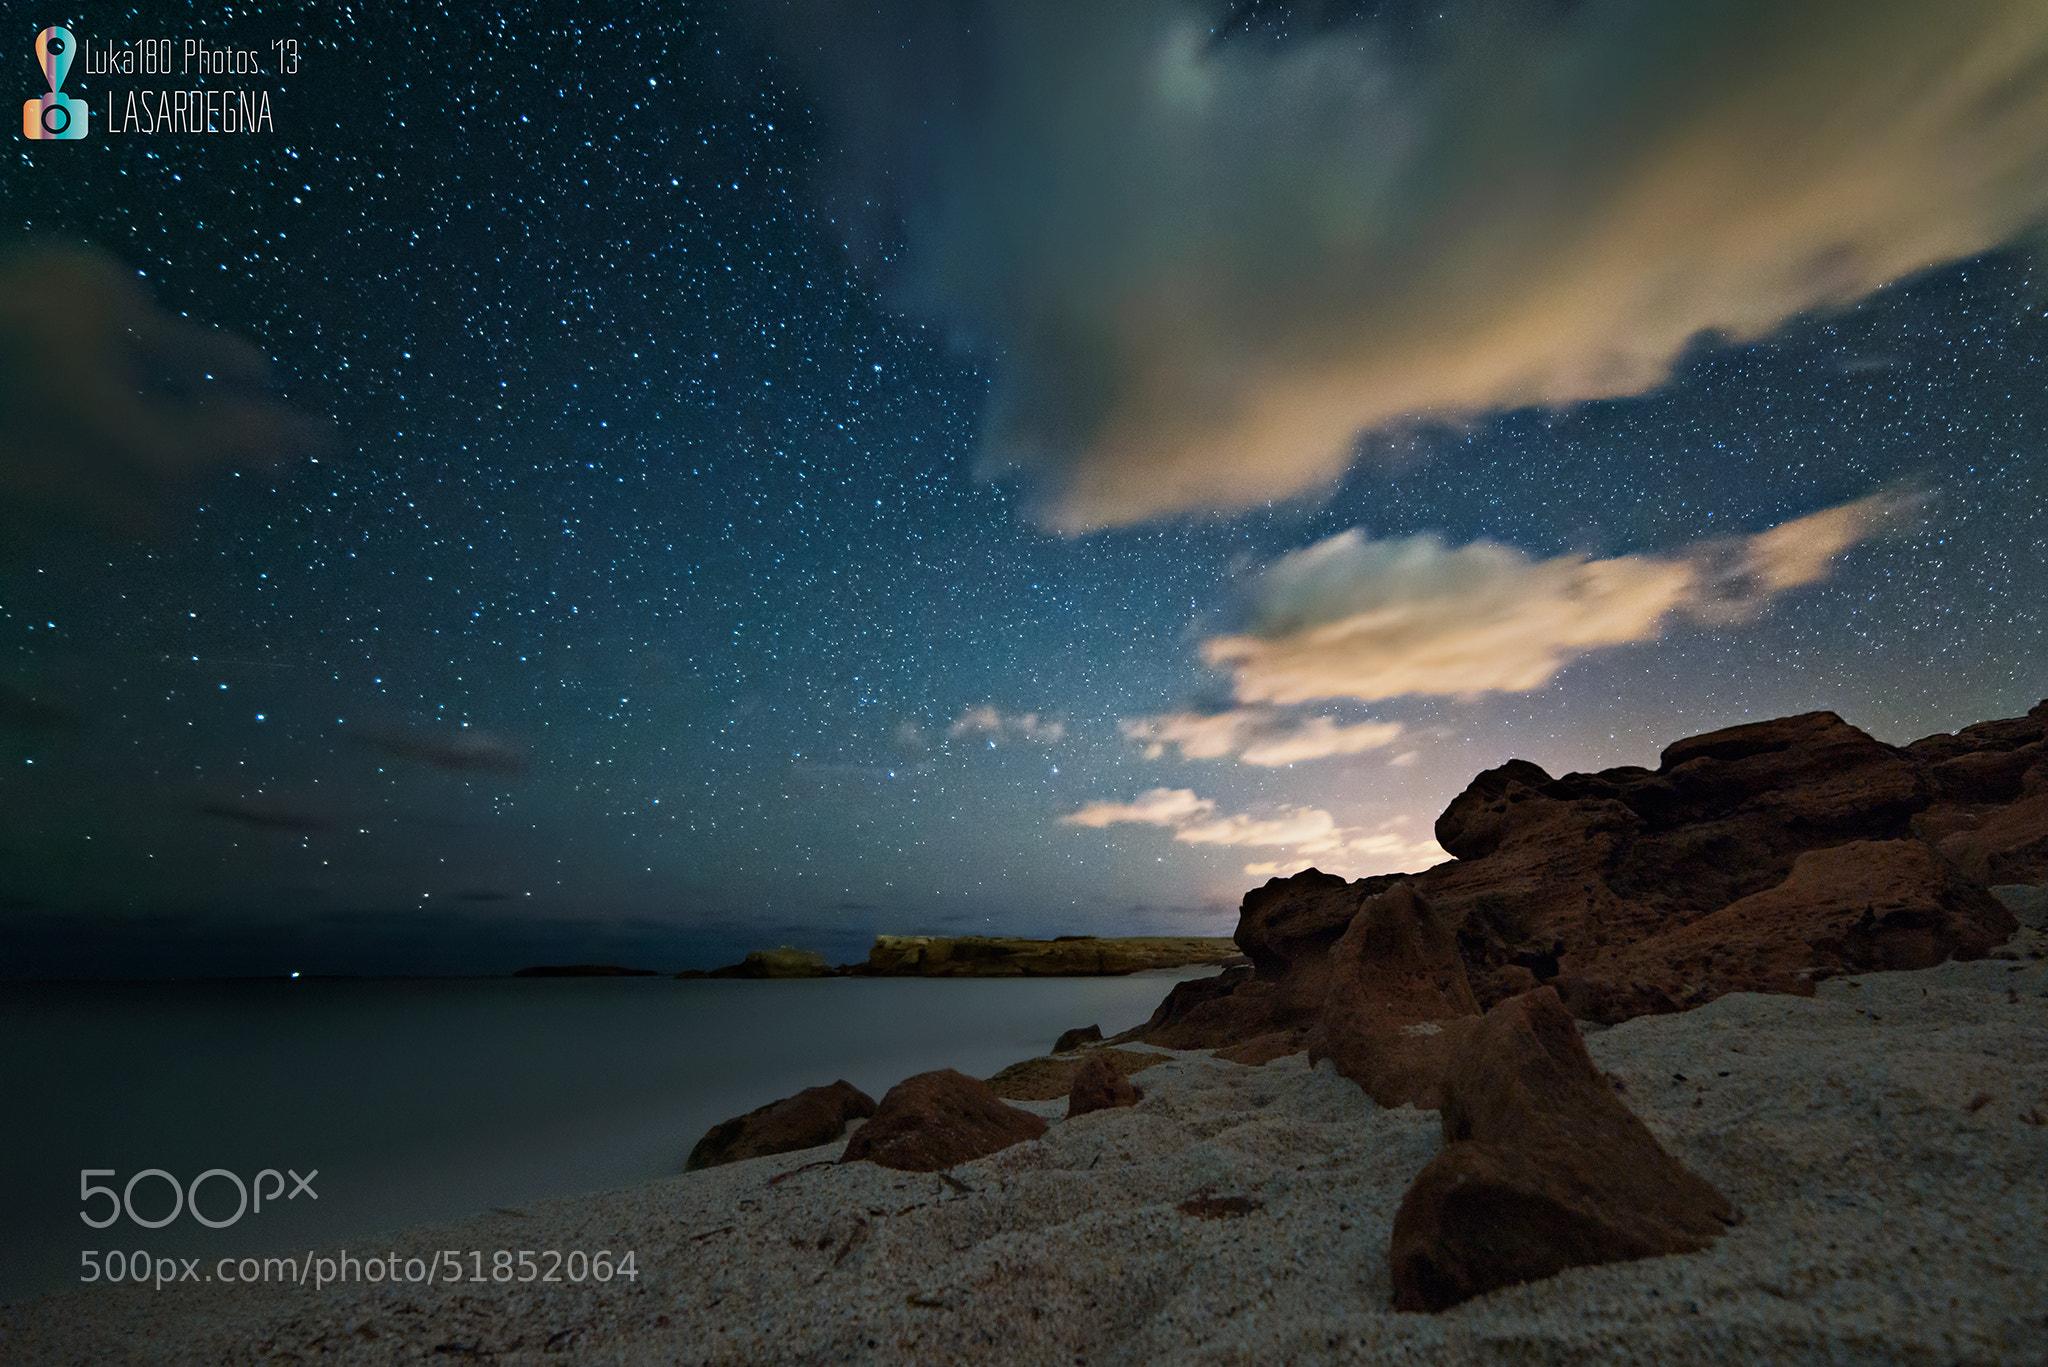 Photograph Sardinia by Luka180 S. on 500px